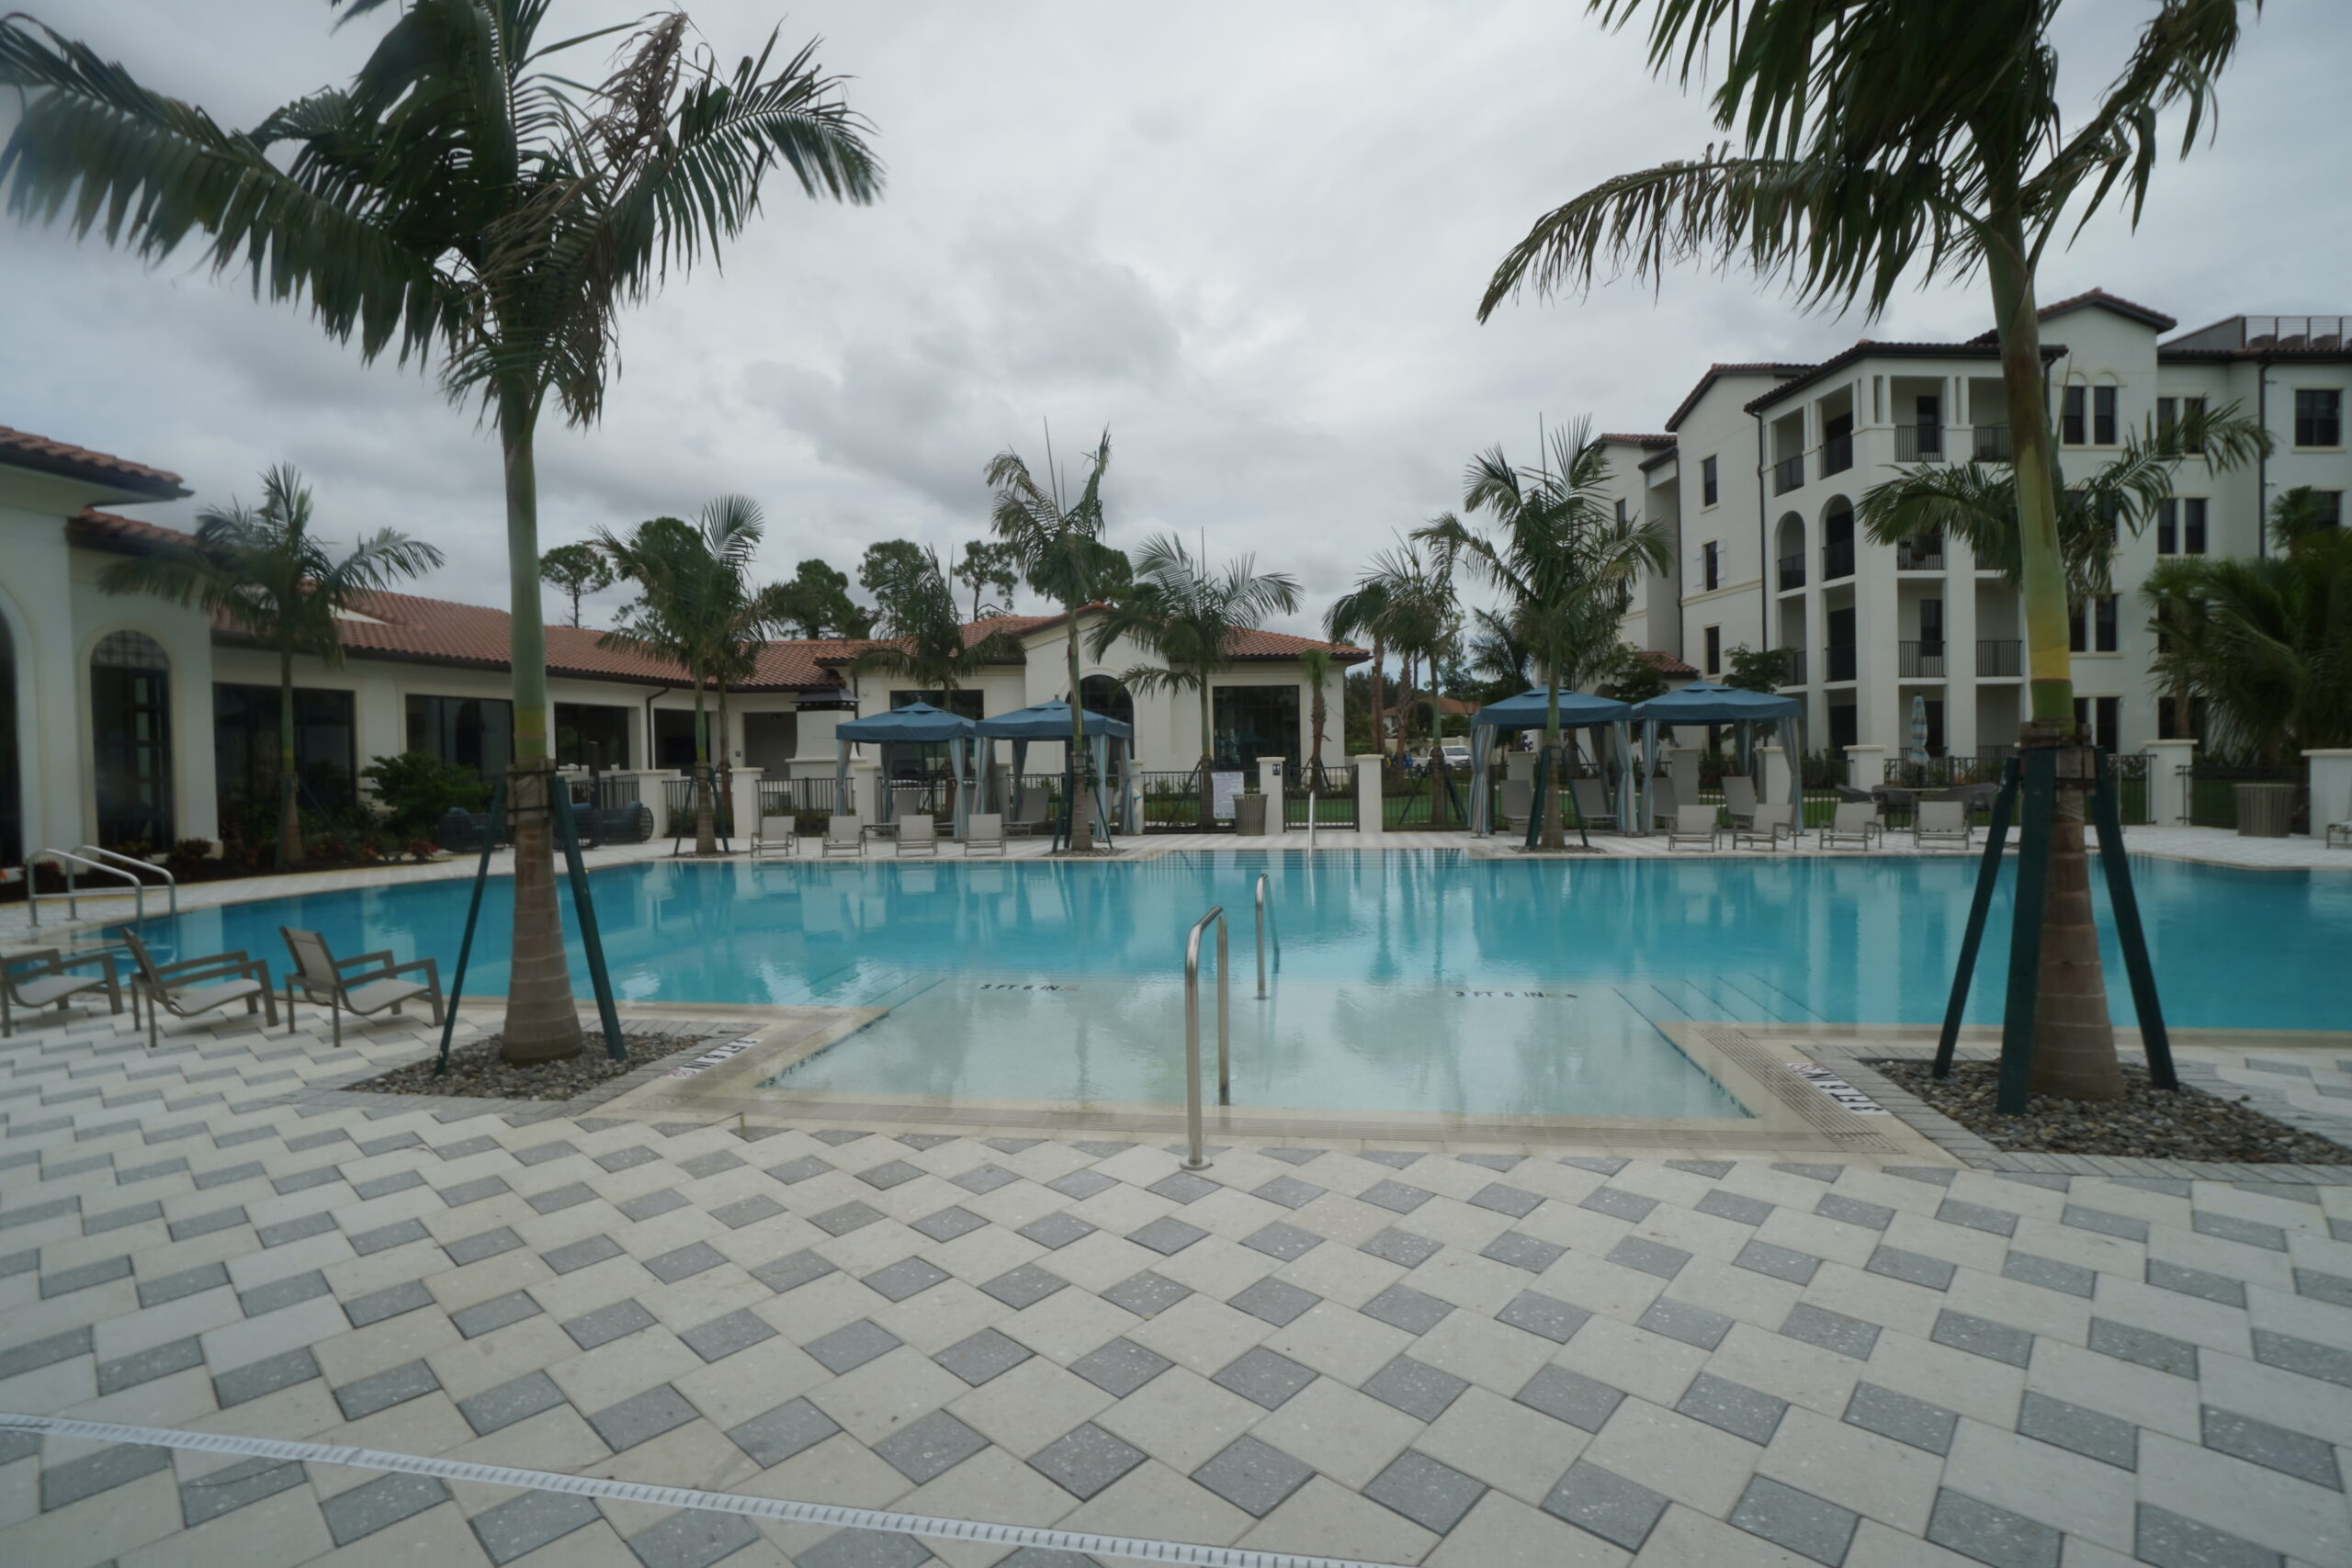 Lago HOA Communmity Pool And Resort Pavers